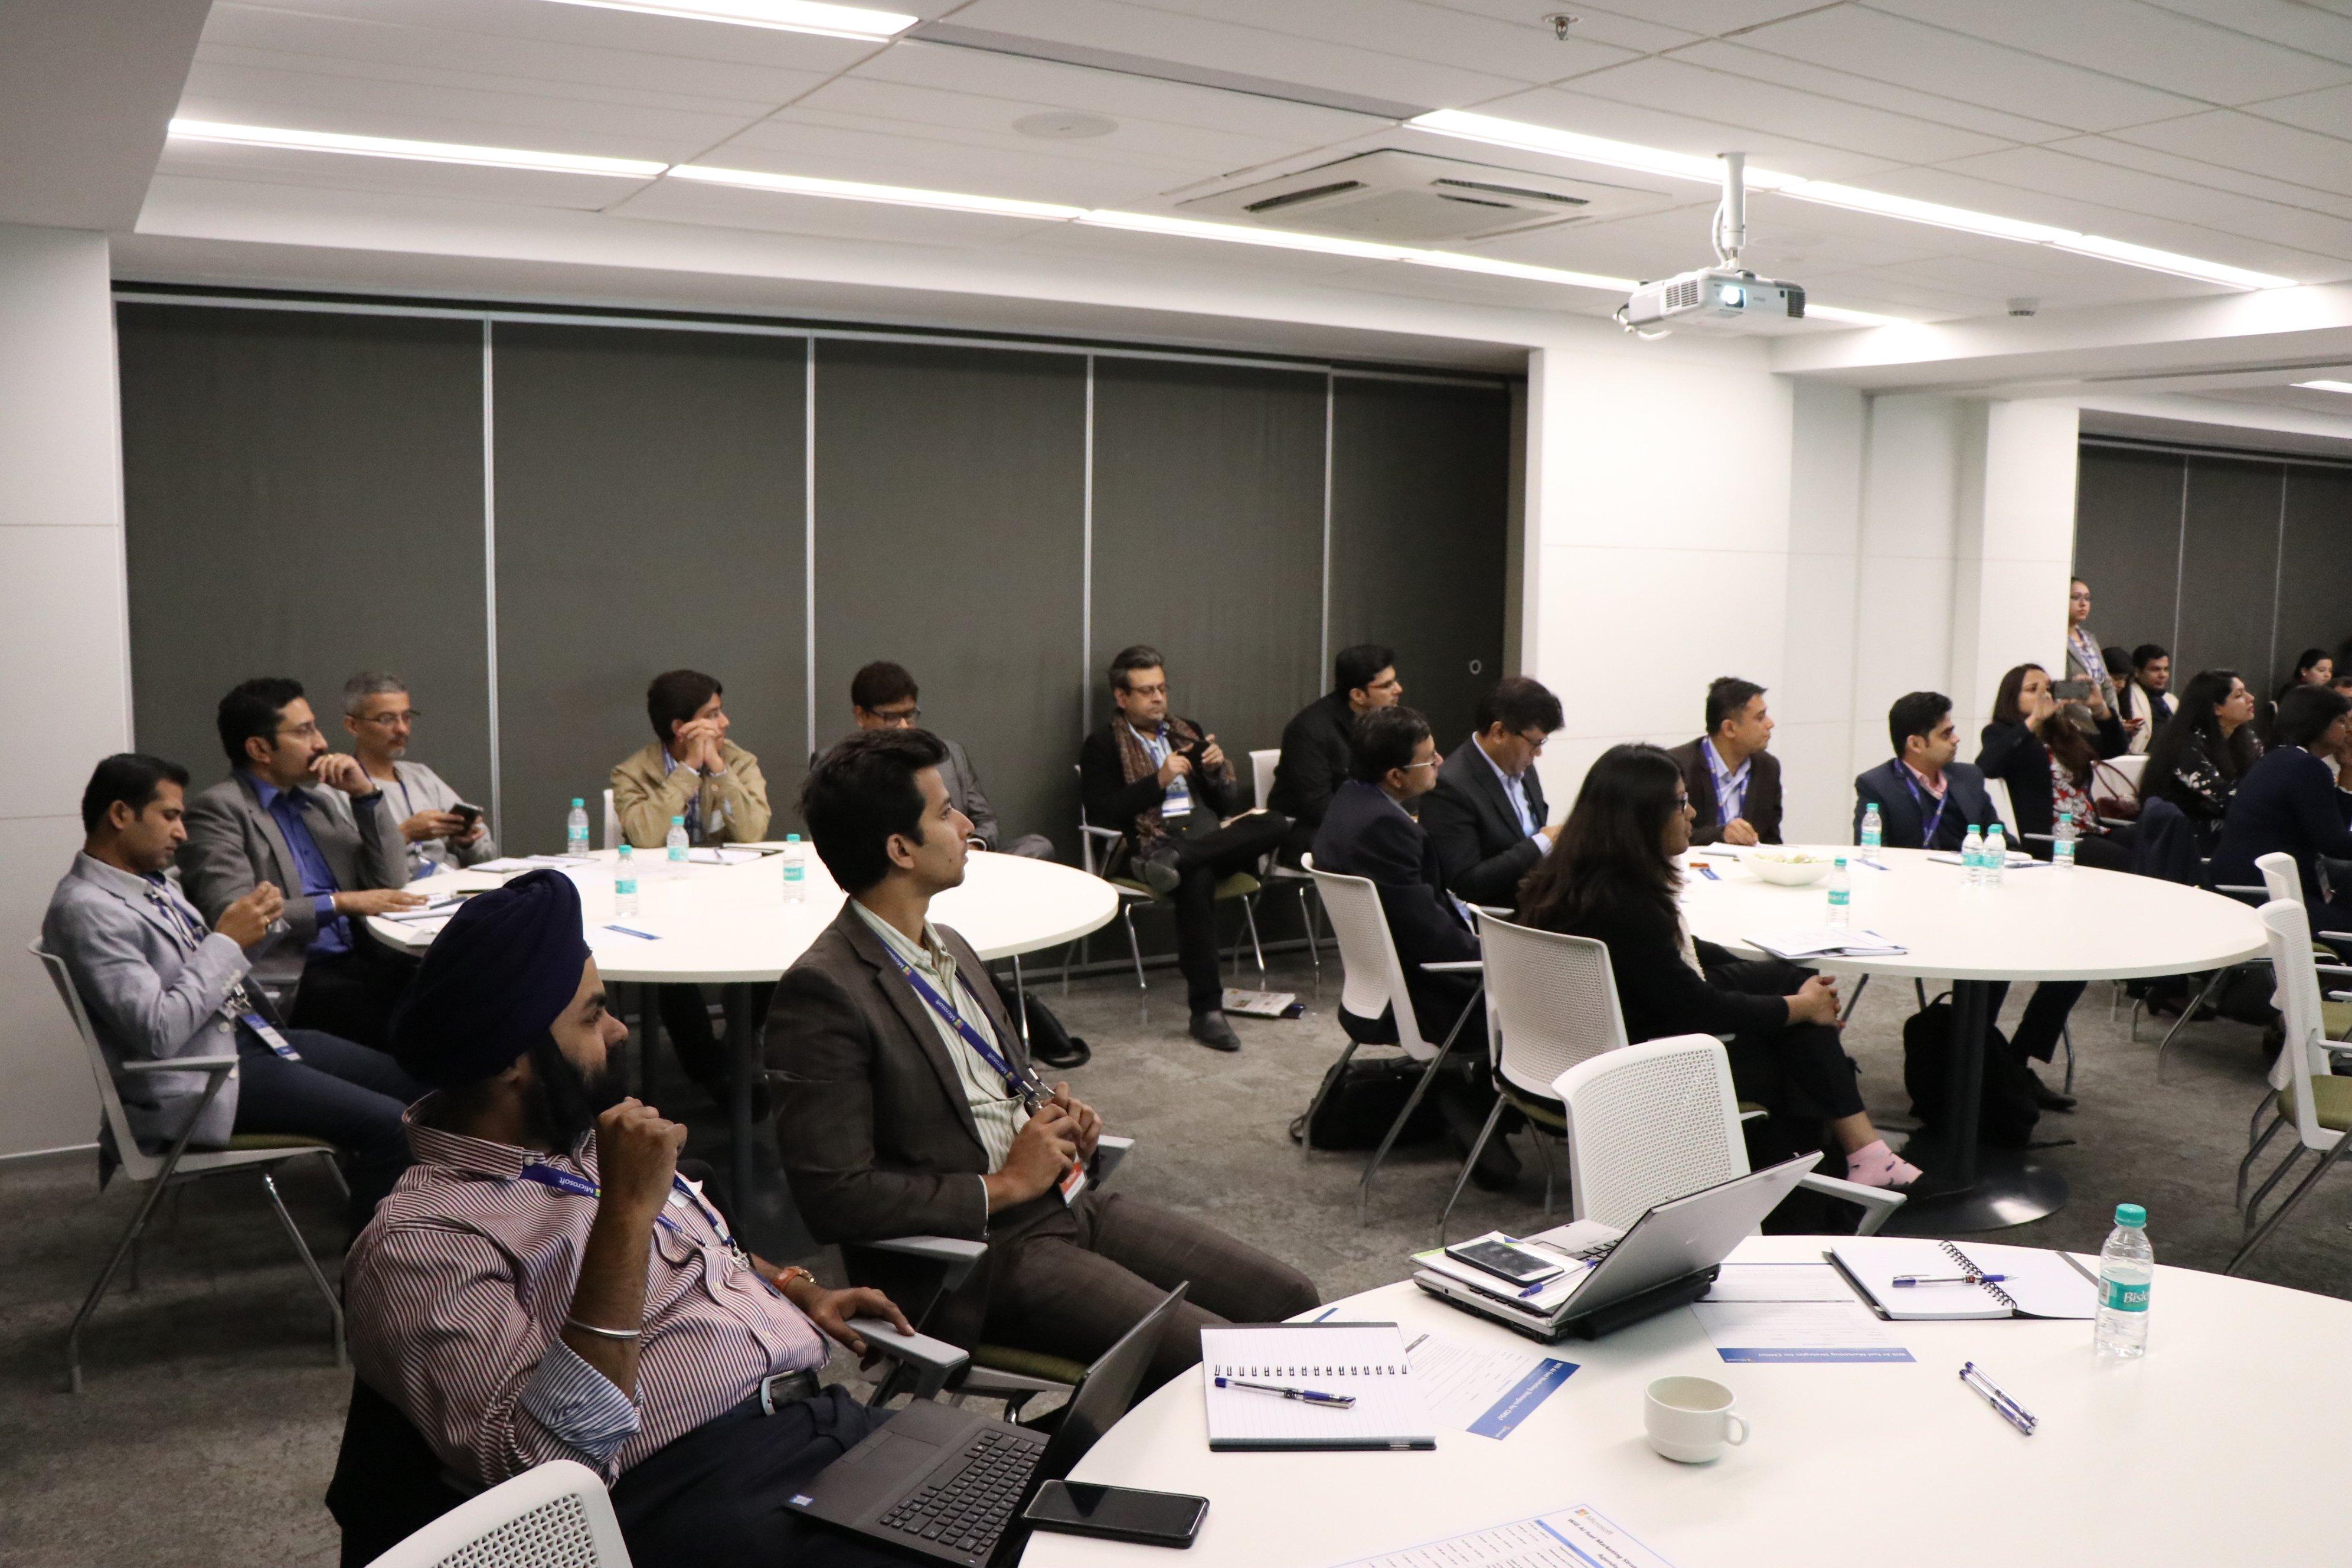 Microsoft Workshop: Participants at the workshop